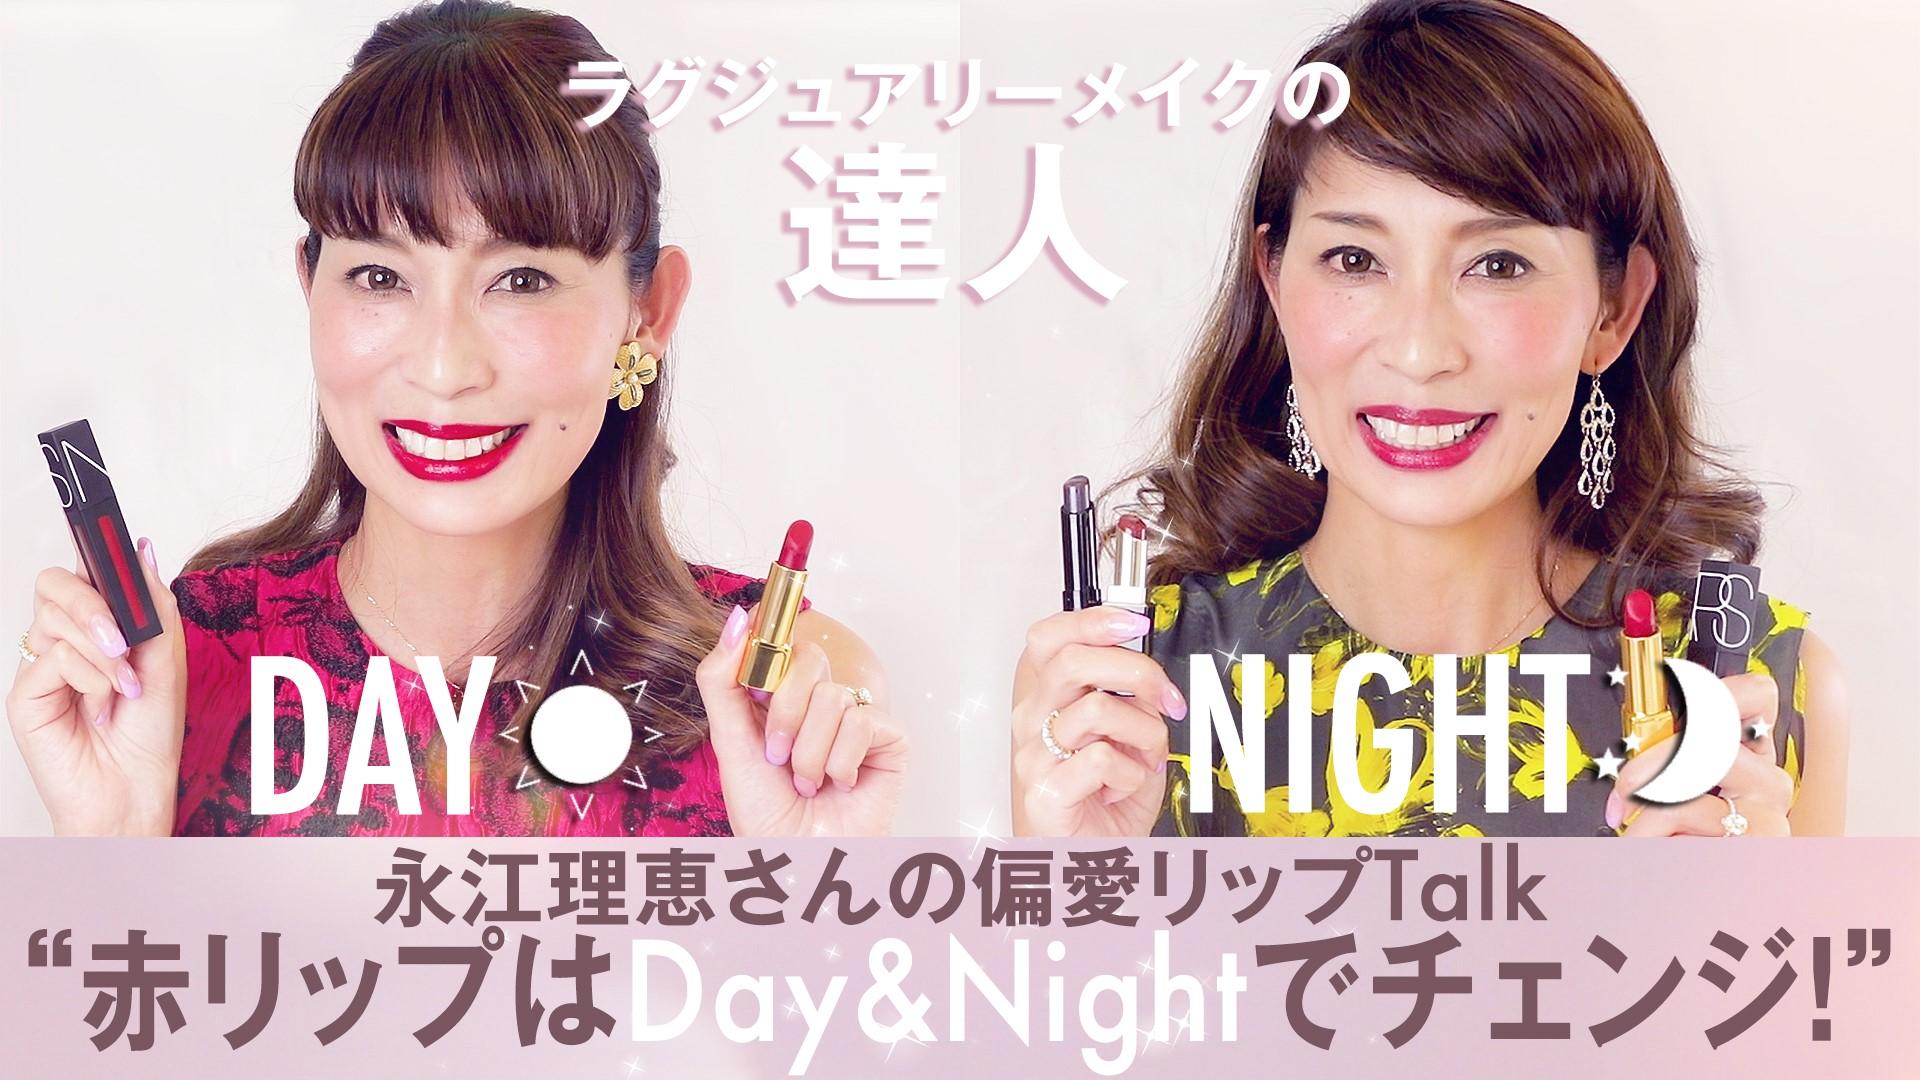 25ans online「エレ女のメイクアップLESSON」永江理恵の赤リップメイク